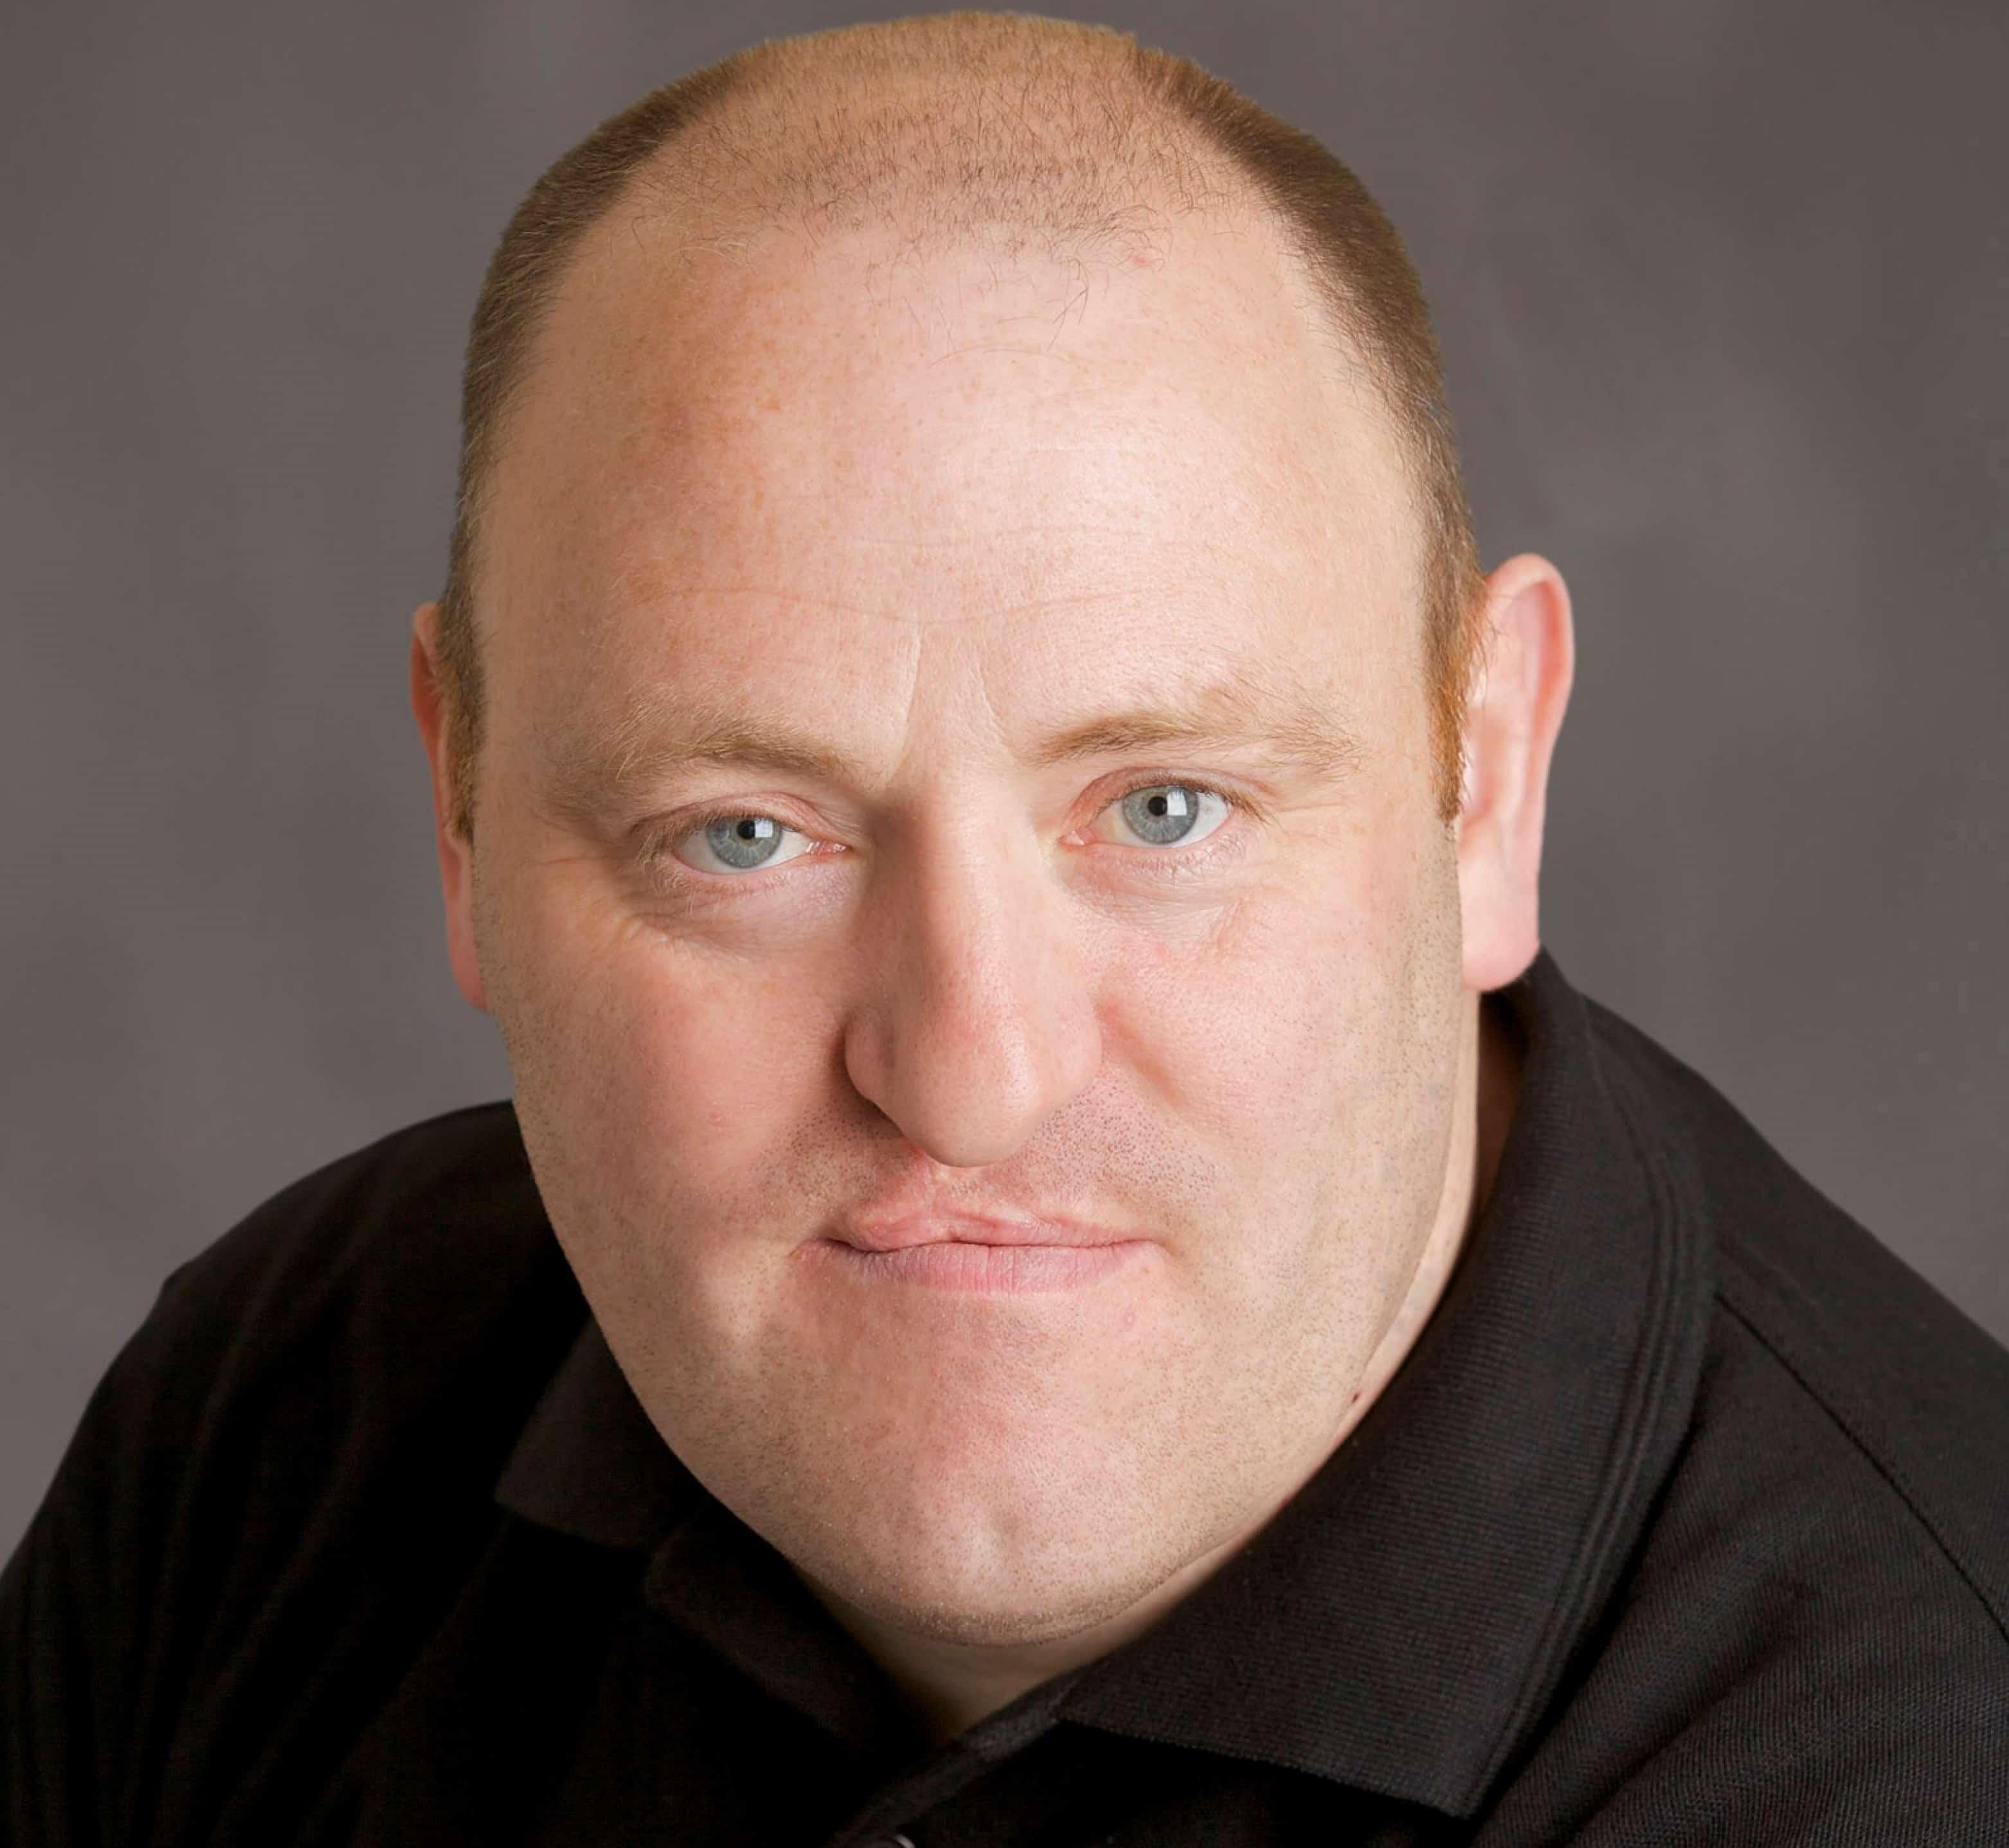 Ken Donegan